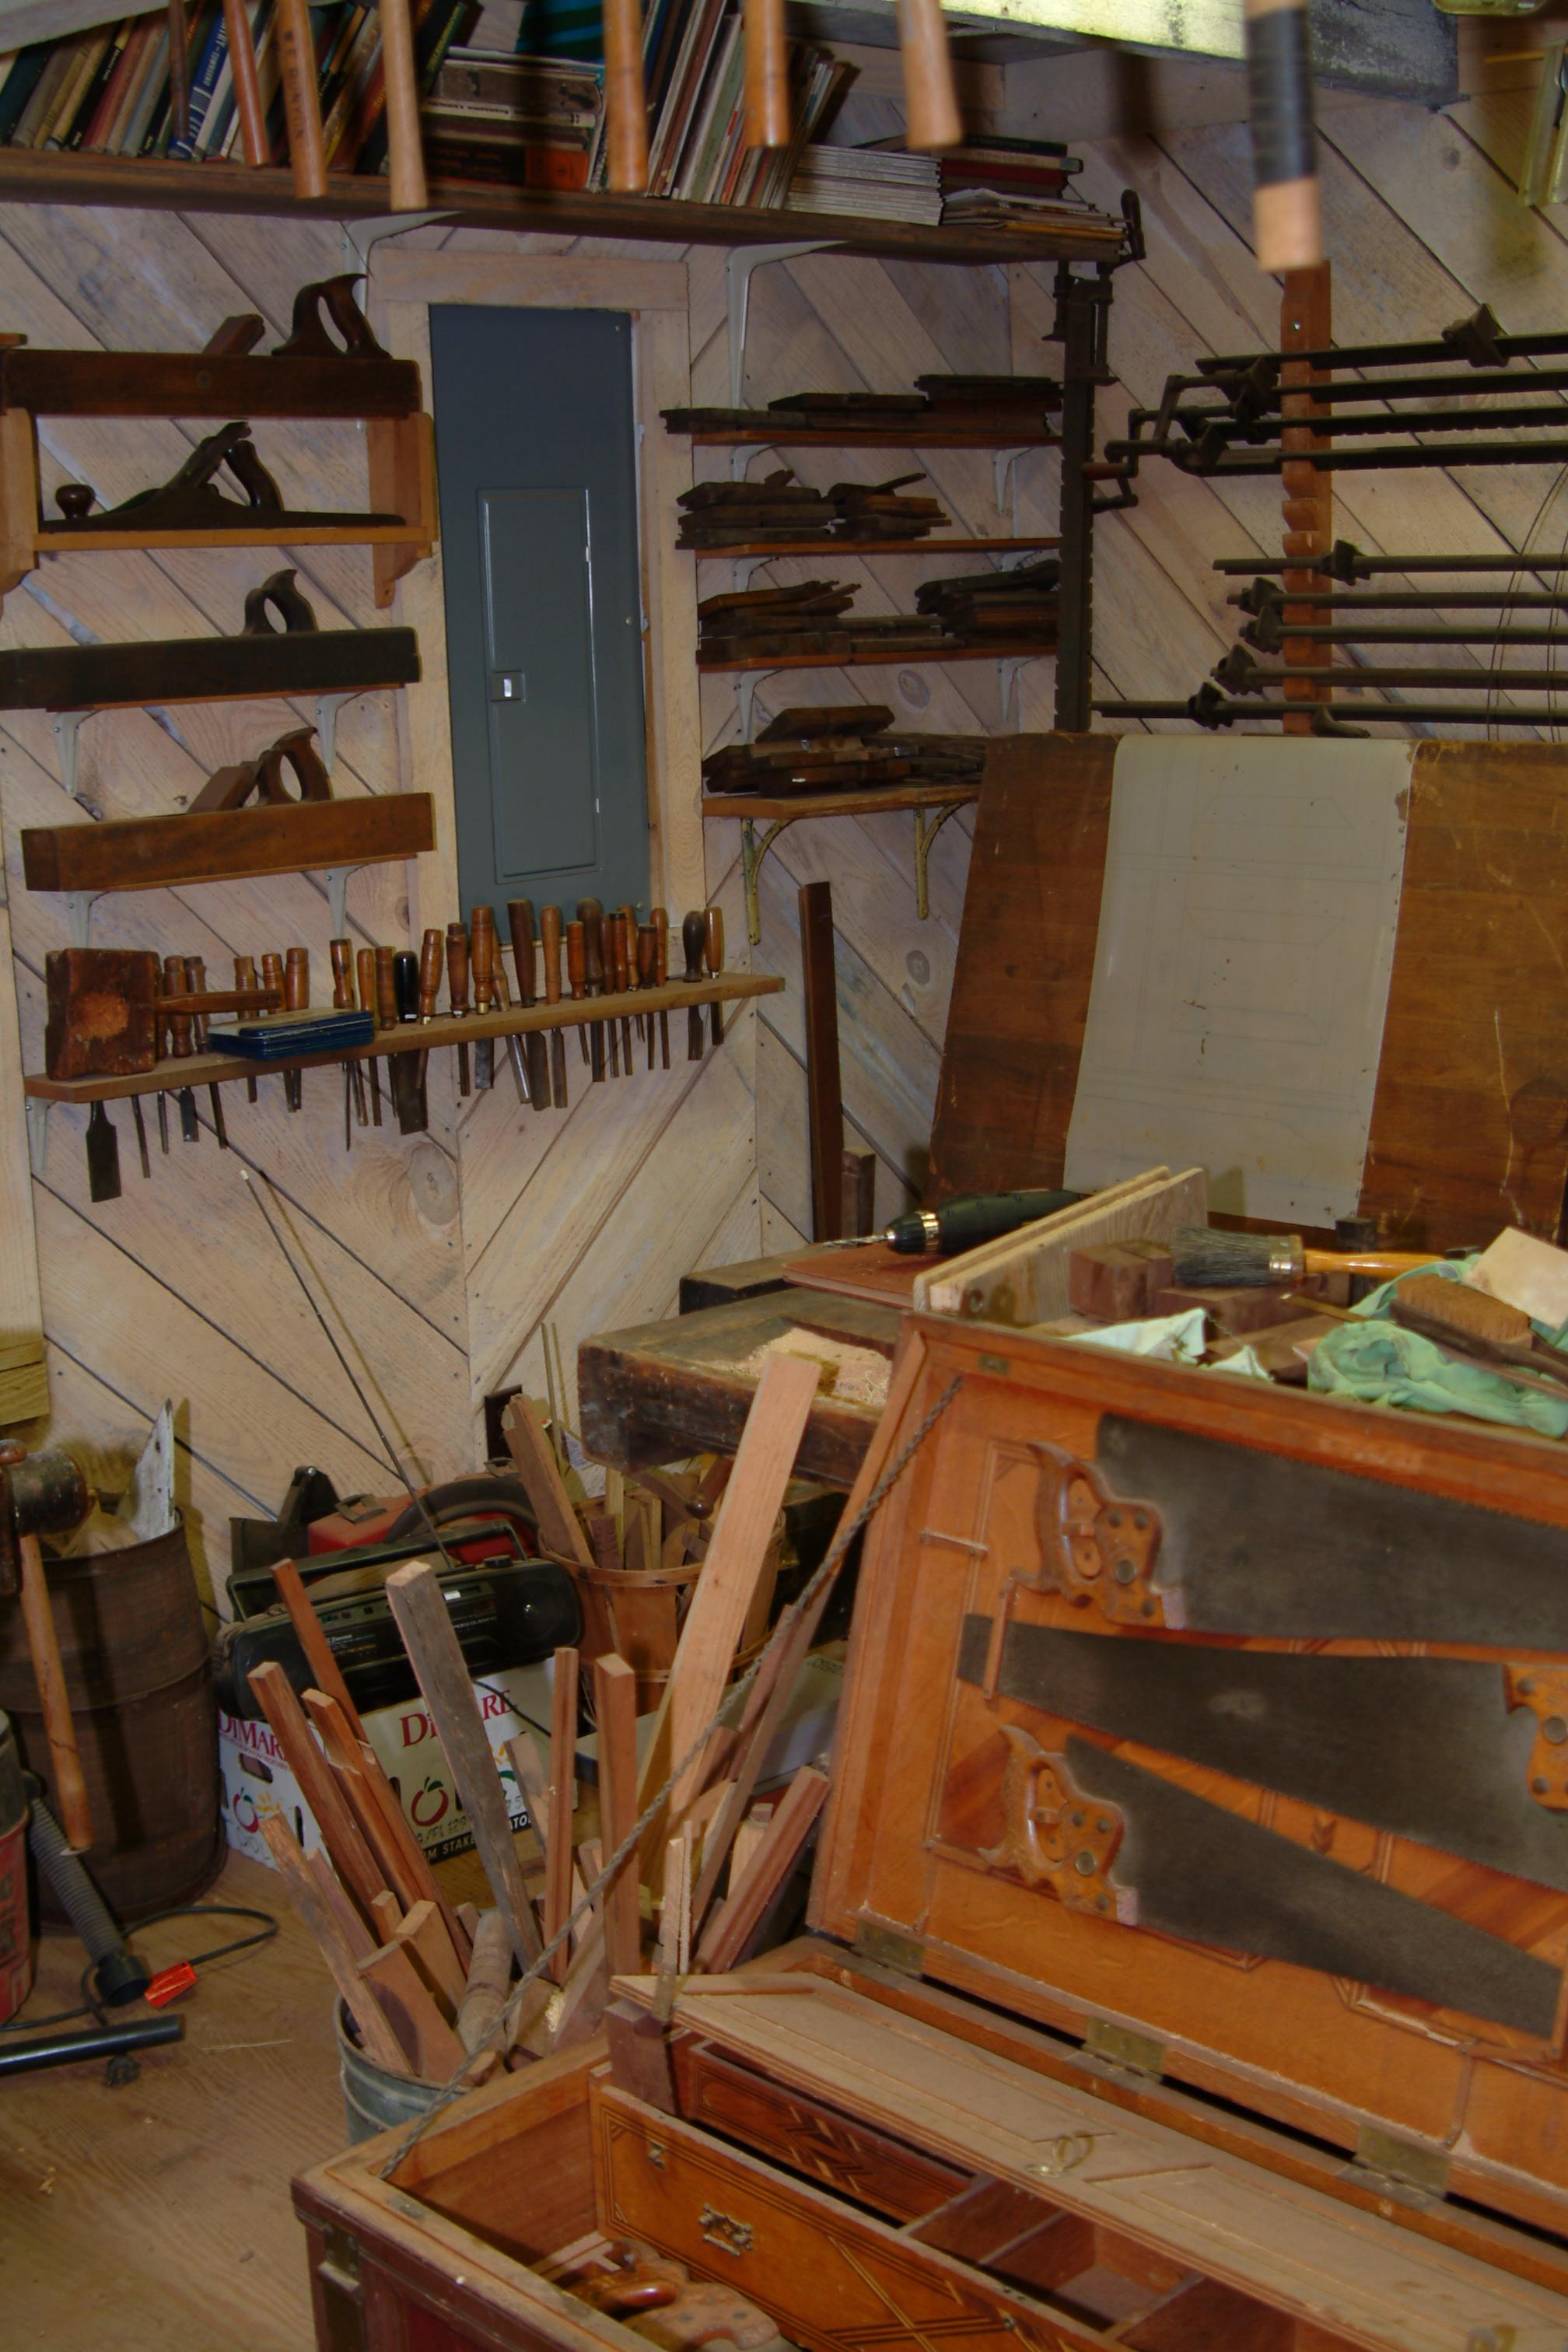 FT Wood Shop Maloof Photos 218.jpg